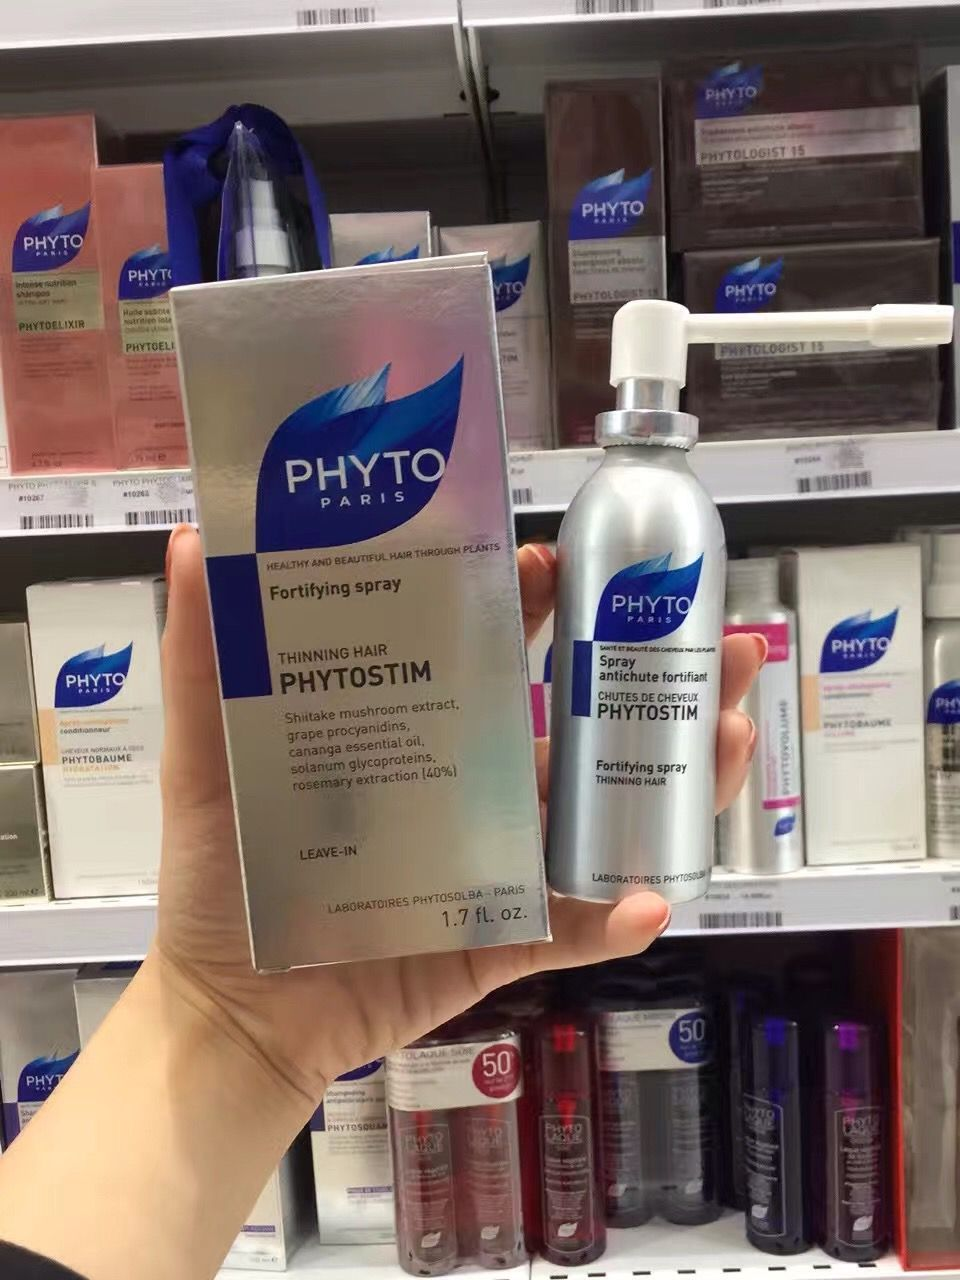 Phyto phytostim髮朵防脫生髮噴霧50ml 脫髮問題不用愁,小小噴霧就能解決💁🏻♂️富含真正有能量的活性成分,促進頭髮自然生長。將花菇、從葡萄中提取的花青素🍇和依蘭精油相結合,保護髮根,迅速阻止頭髮掉落,促進頭皮細胞新生。同時龍葵糖蛋白直接作用於發根,加速頭髮生長,並持續發力使頭髮強健。還添加了豐富的迷迭香萃取精華,促進頭髮生長的同時平衡頭皮油脂,祛除頭屑,增強頭髮彈性。經科學測驗,使用八周後脫發問題改善86%。 使用方法:搖晃均勻後,仔細噴於頭皮,8到10下可以把整個頭皮噴好。每週兩到三次,用於乾髮或濕髮上均可。